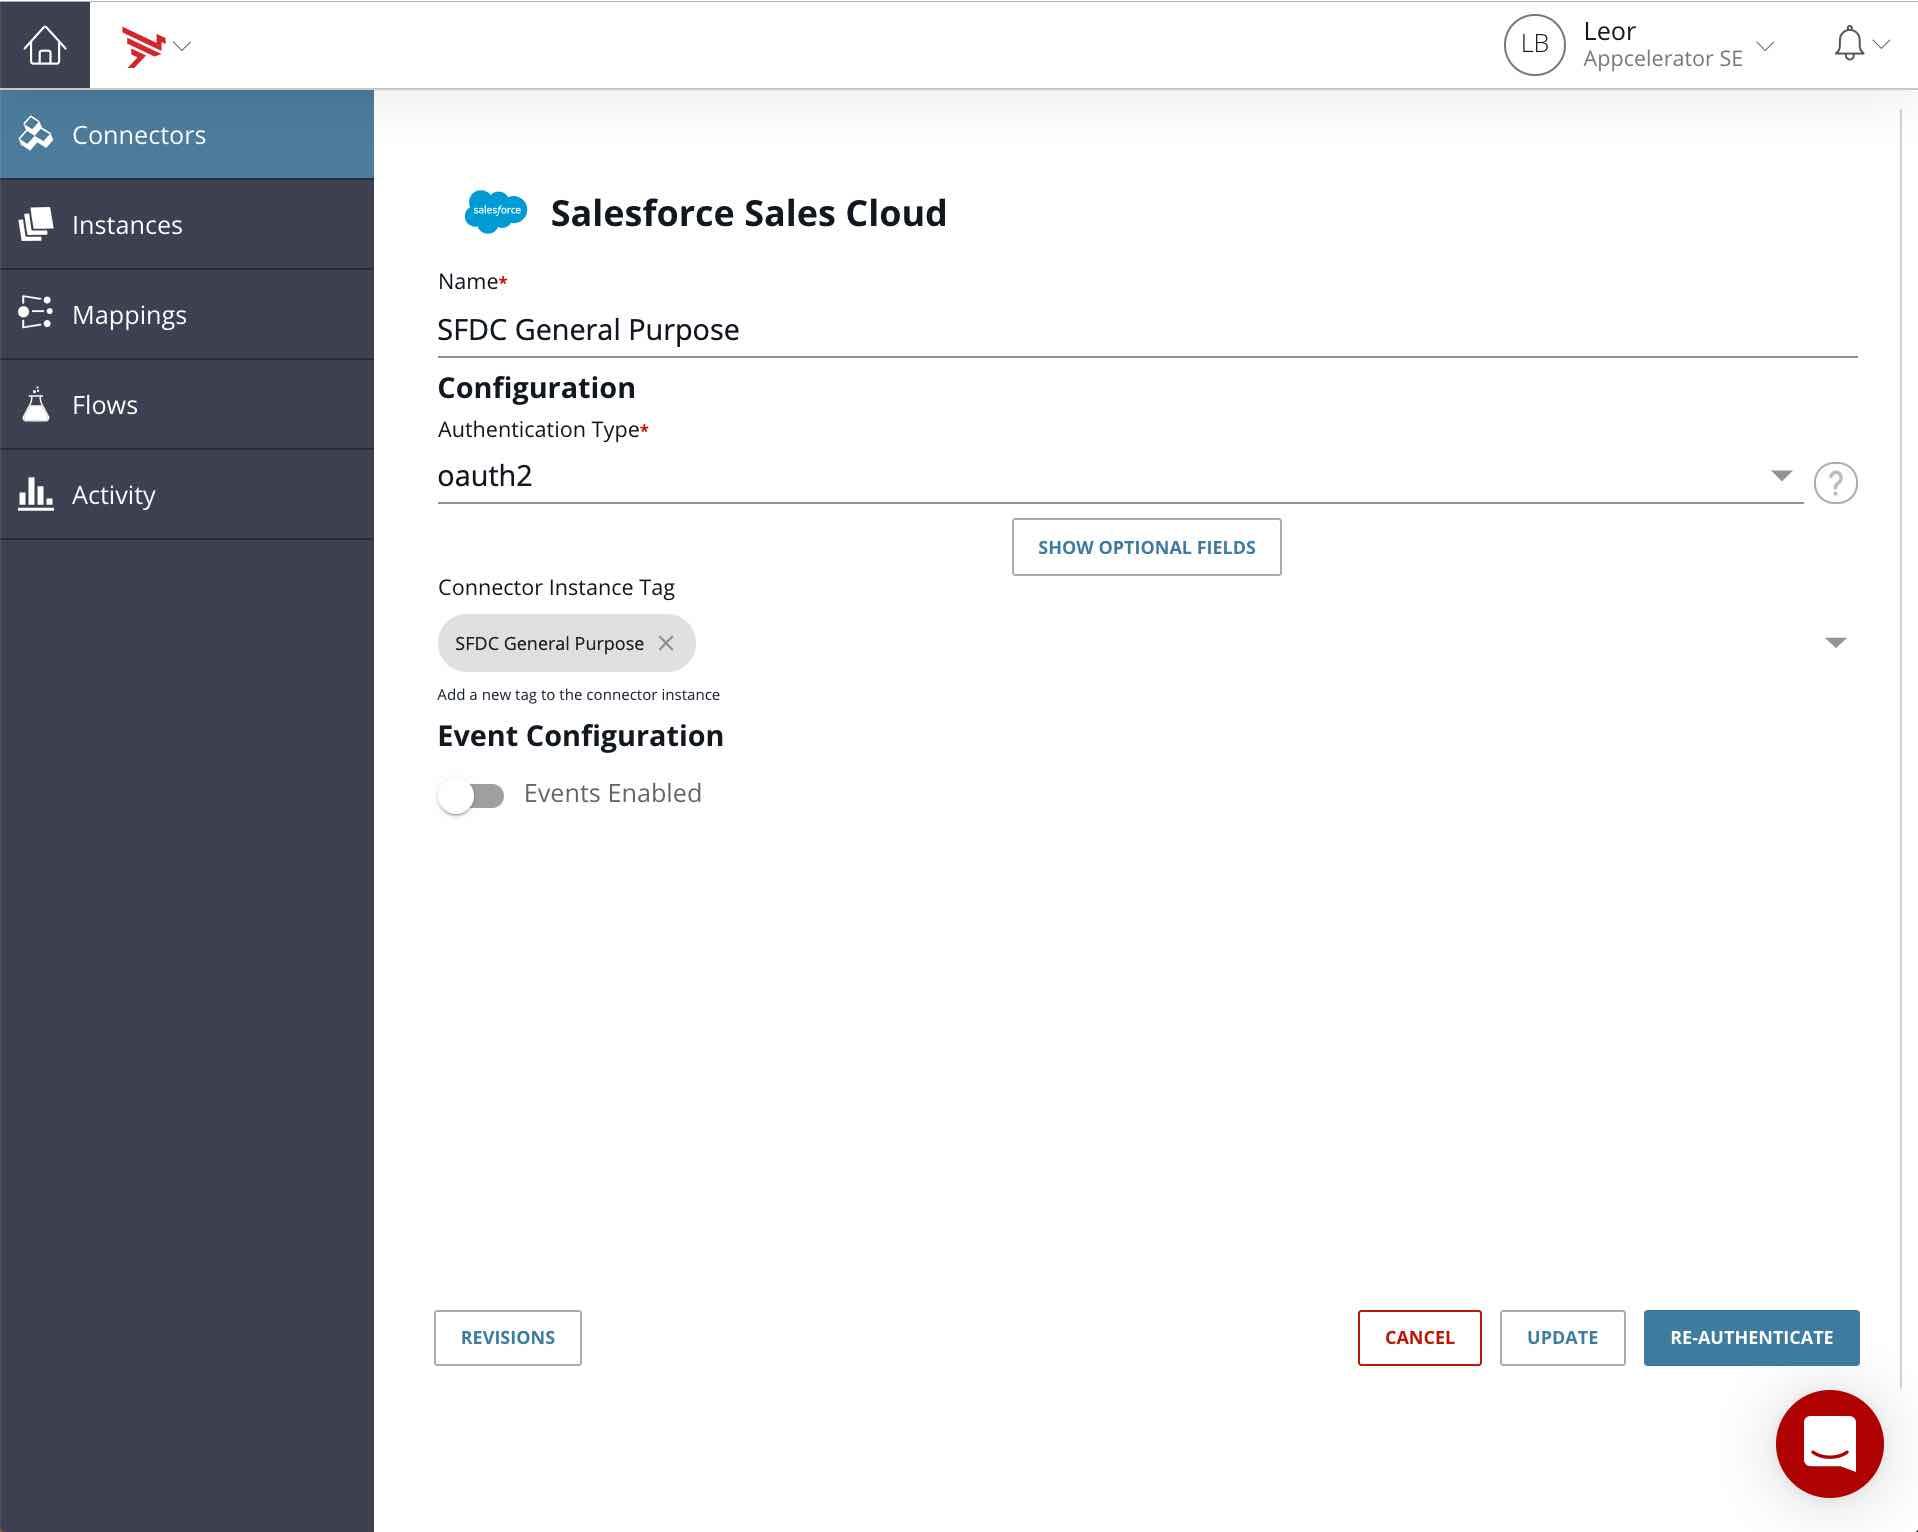 Create a Salesforce Sales Cloud Connector instance